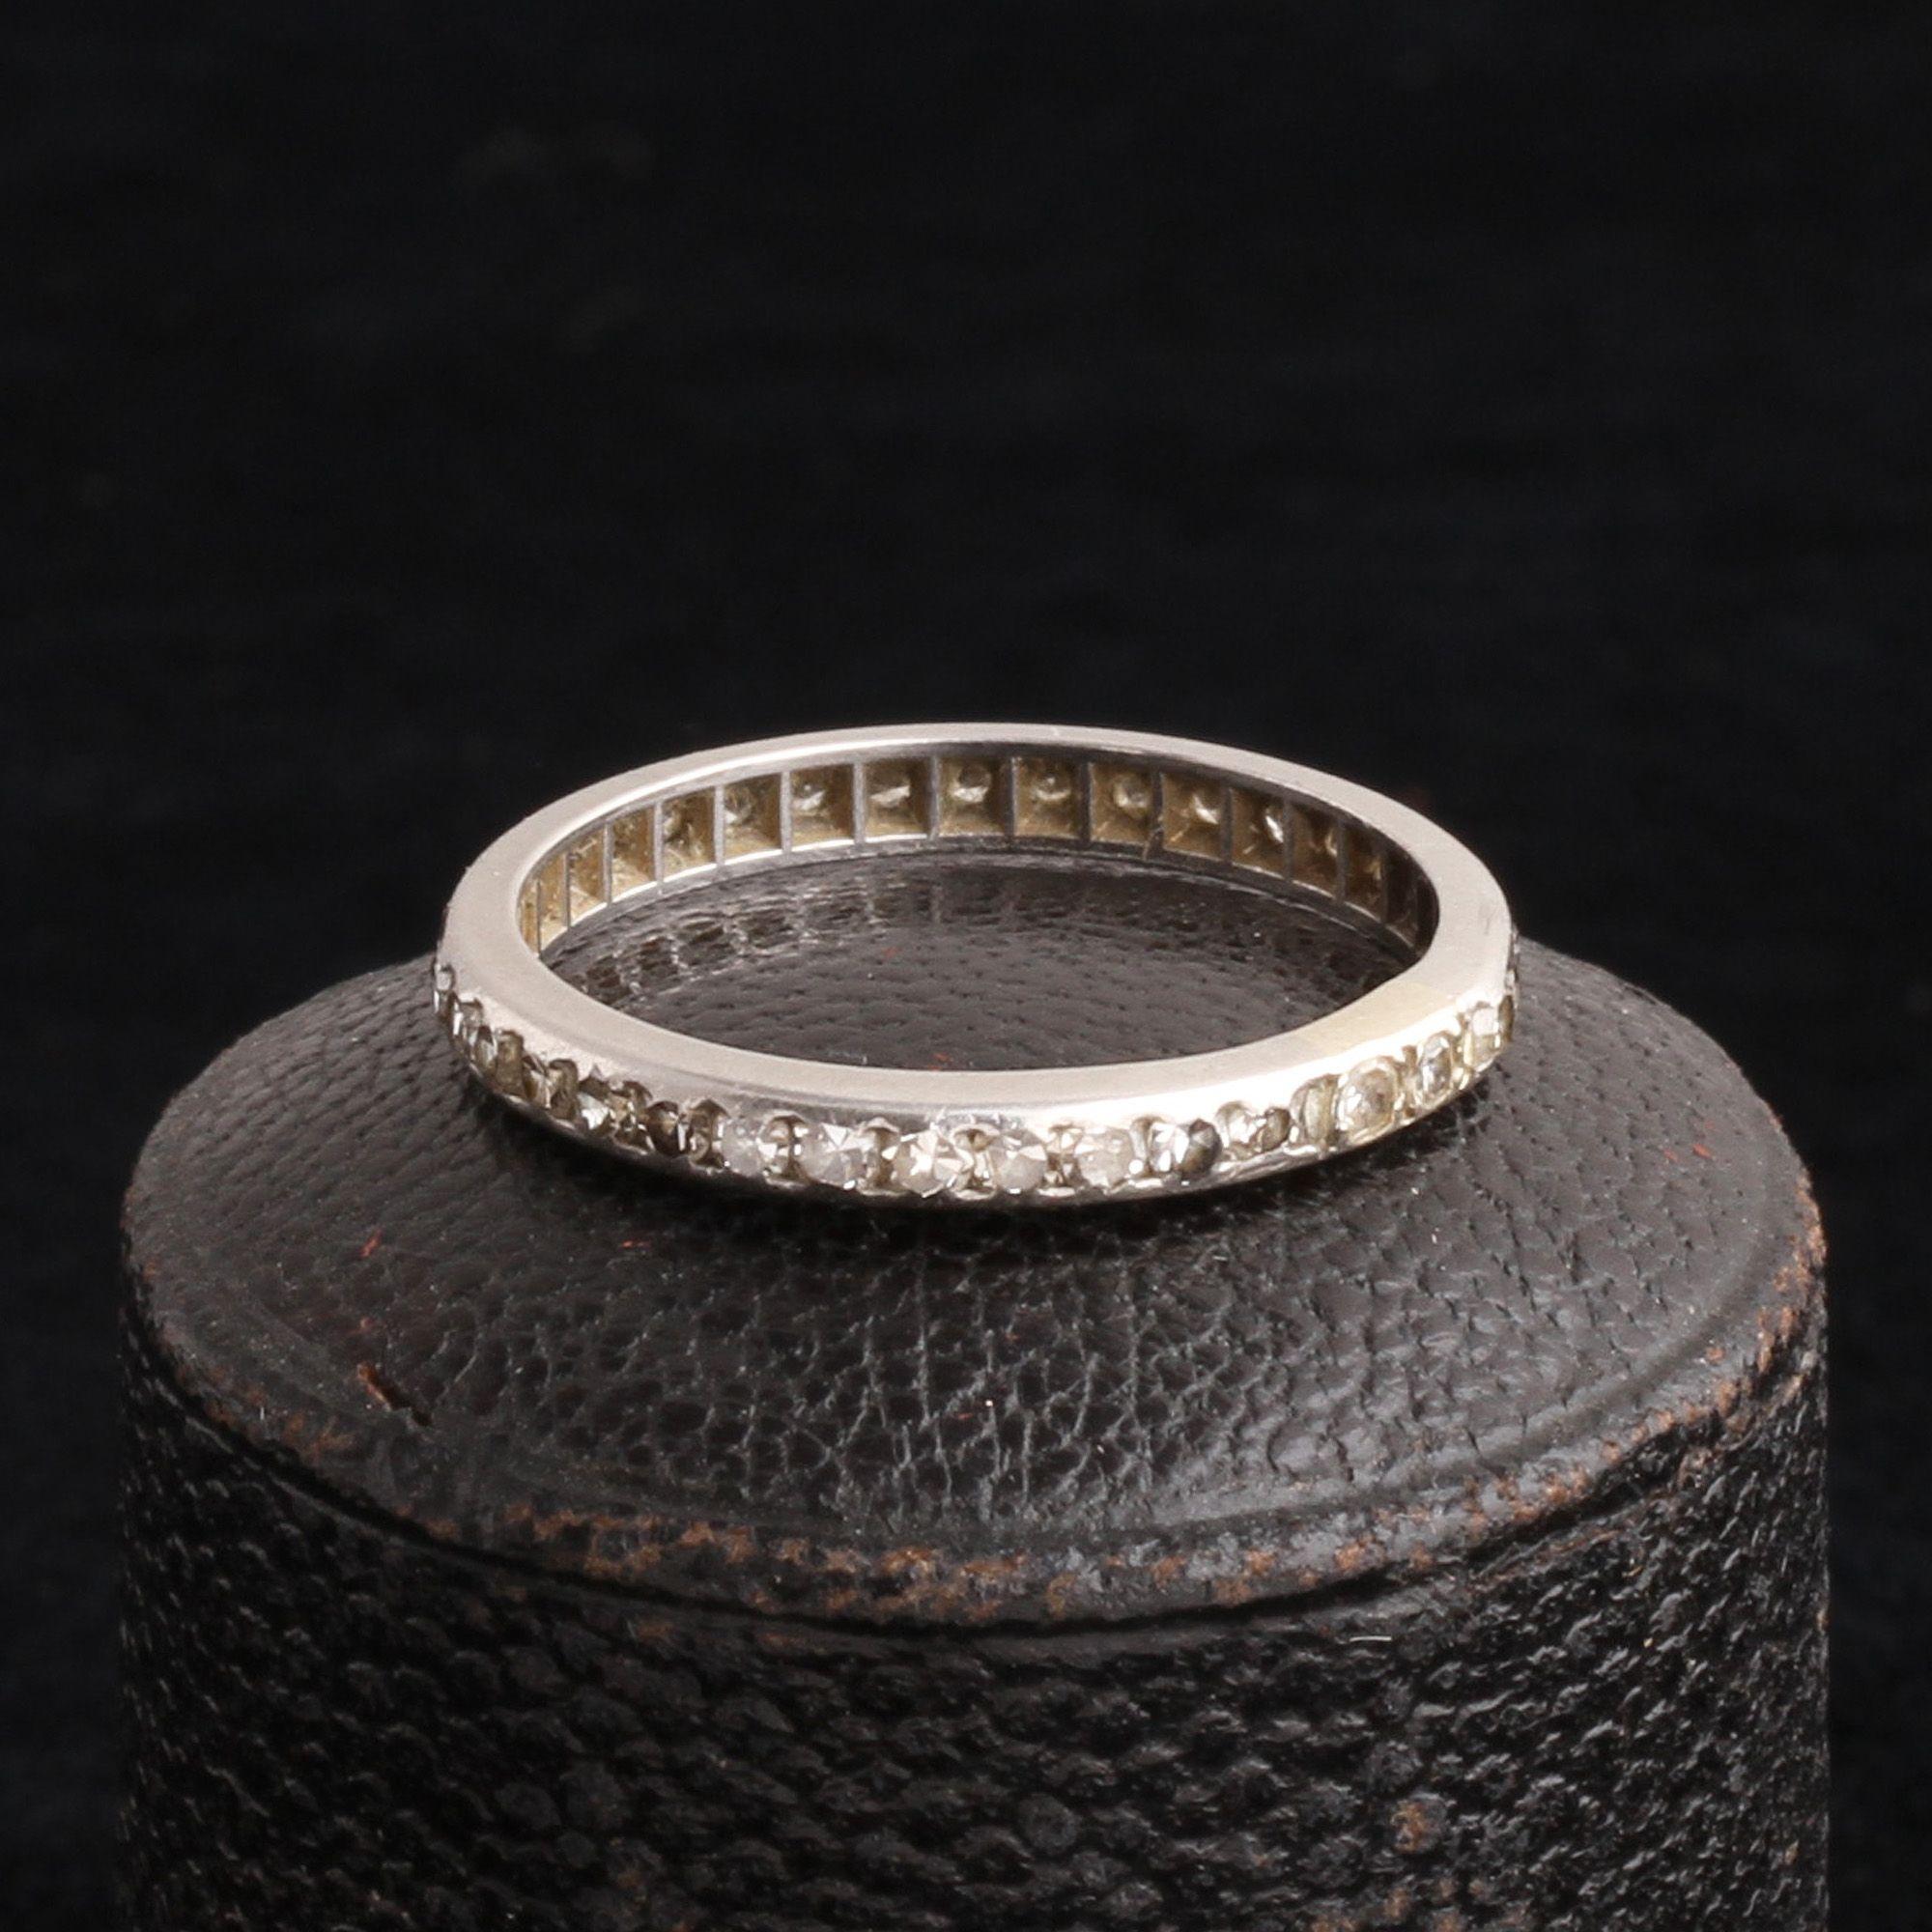 Vintage Platinum Eternity Ring Size 6.25